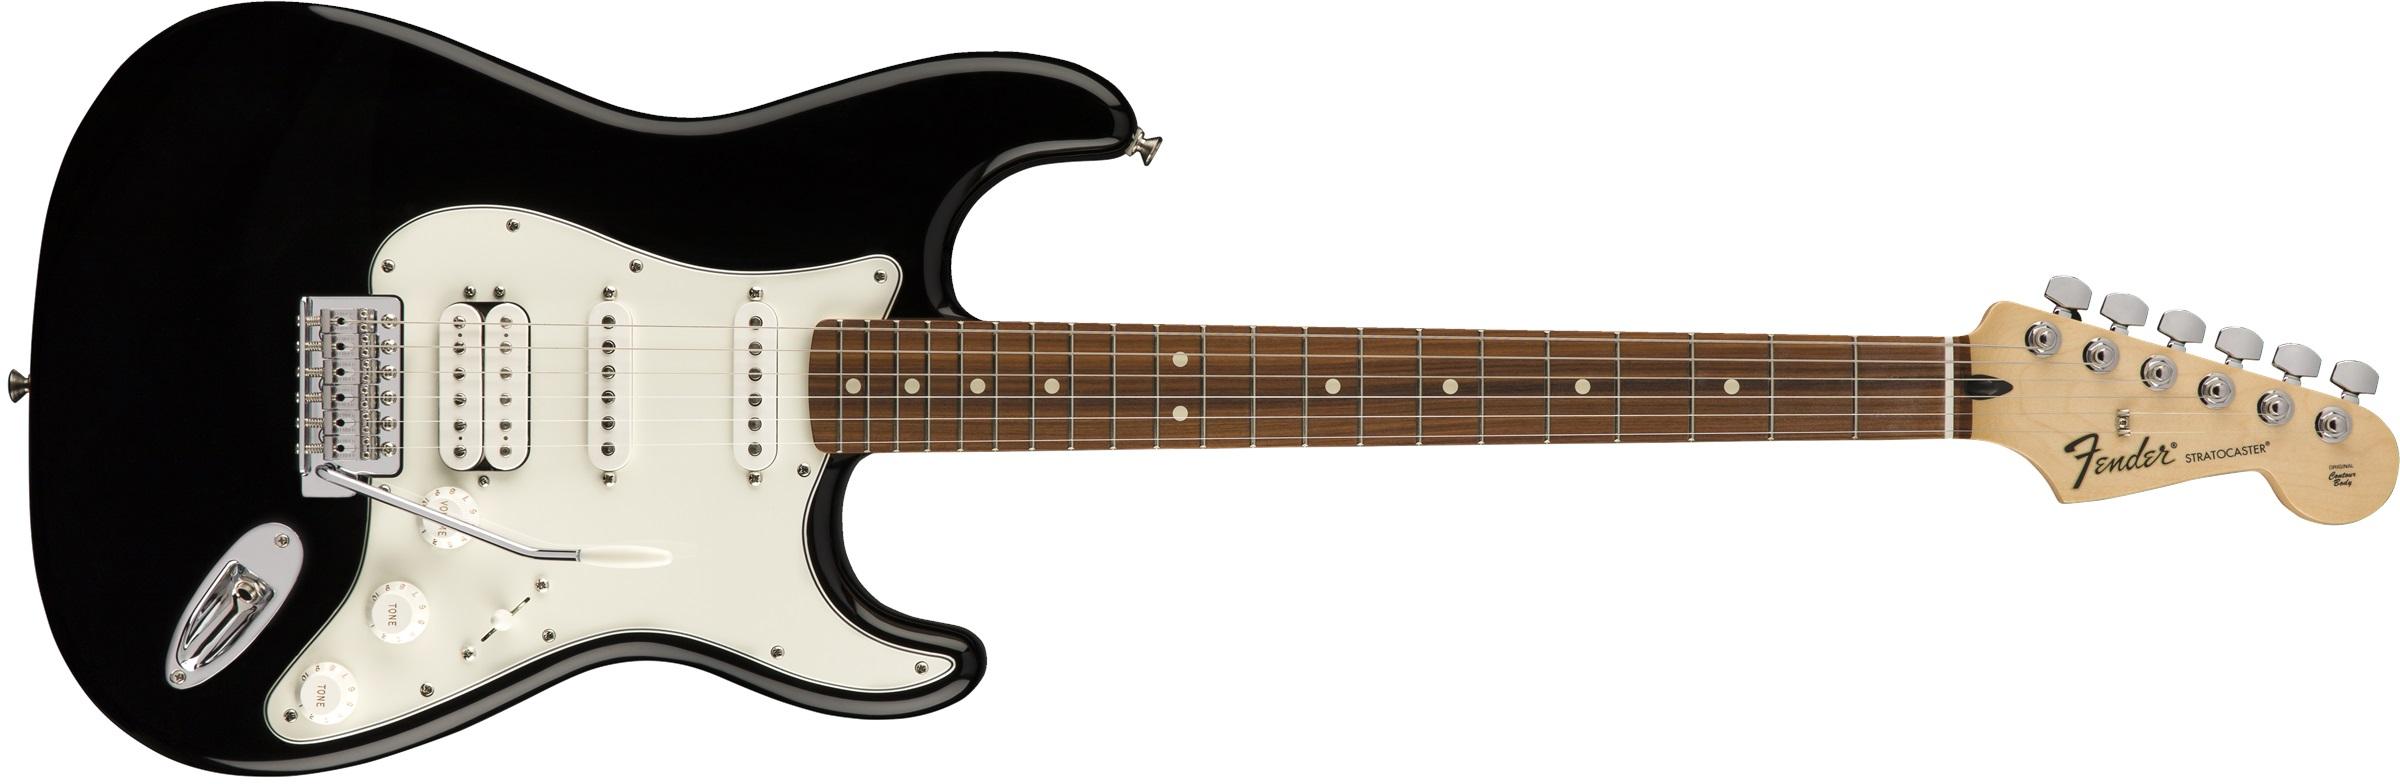 Fender Standard Stratocaster HSS PF BLK